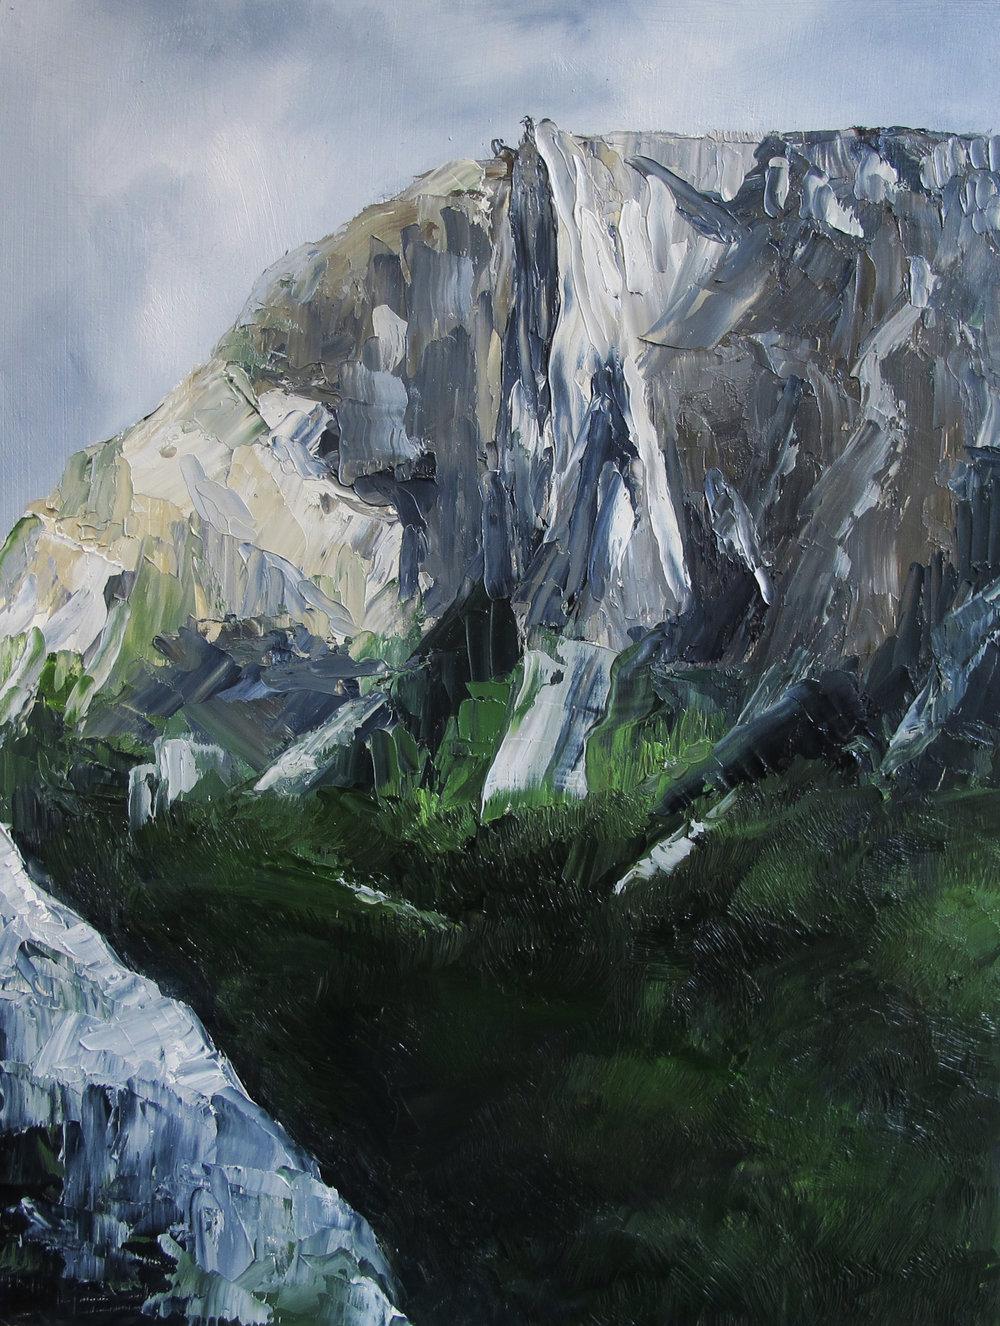 Yosemite Wilderness 2.  Oil on Panel.  12 x 9.